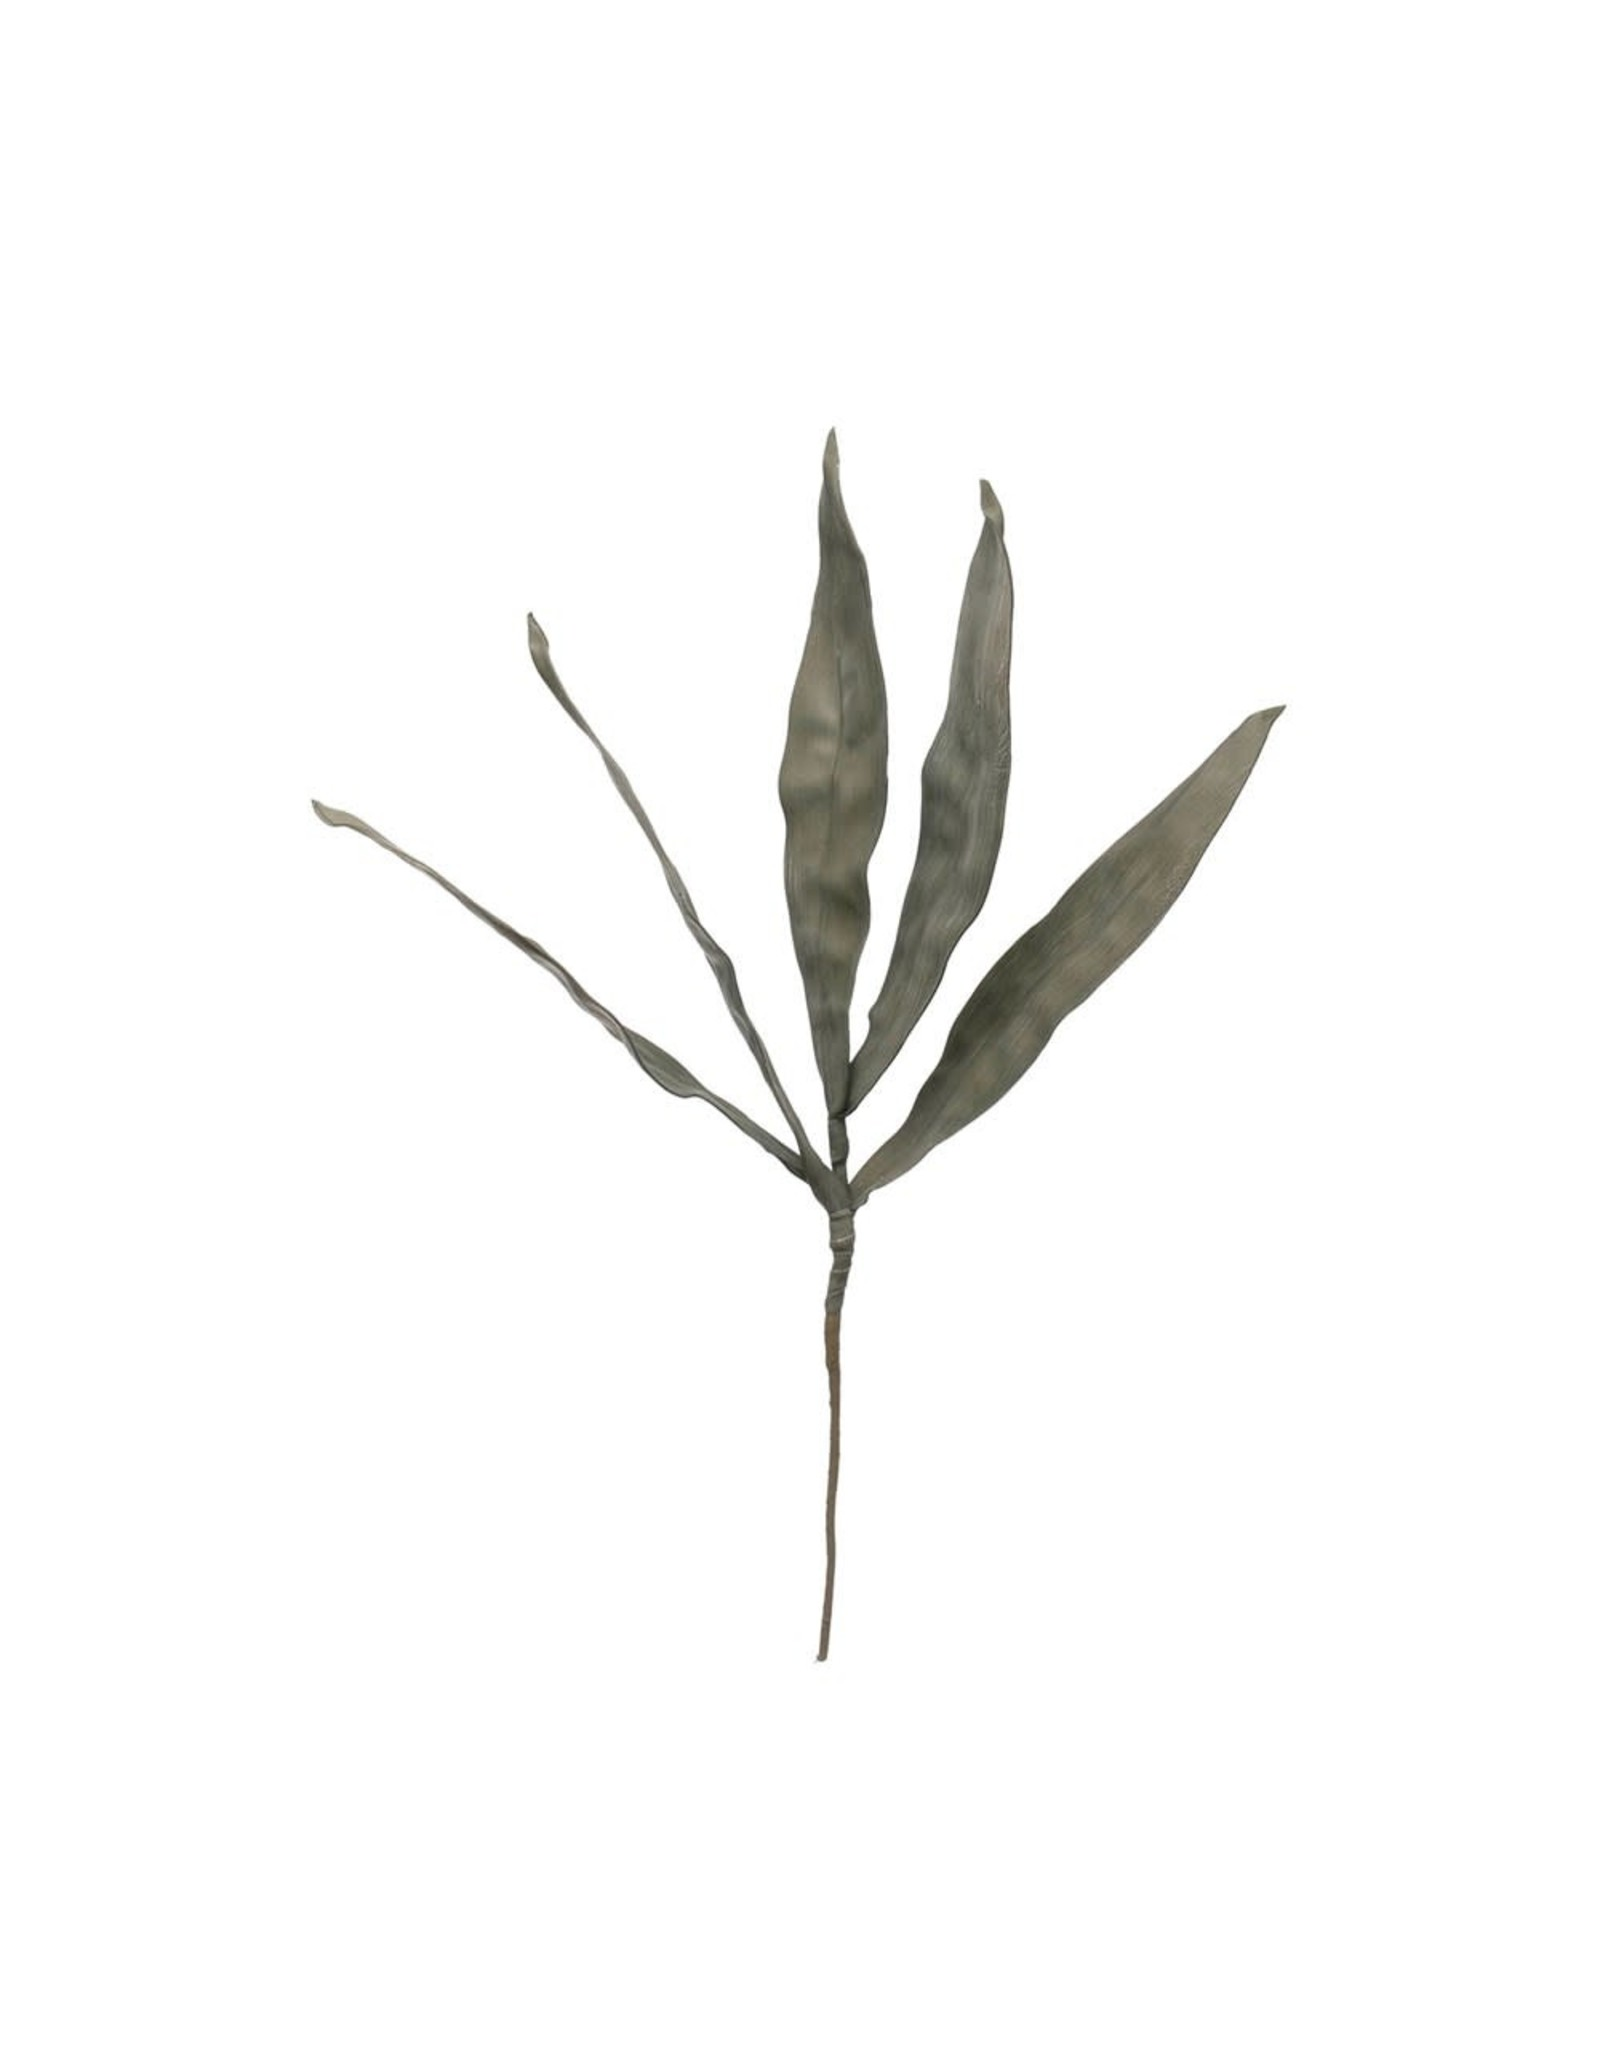 "Creative Co-op 25 1/2"" H Eva Leaf Branch"